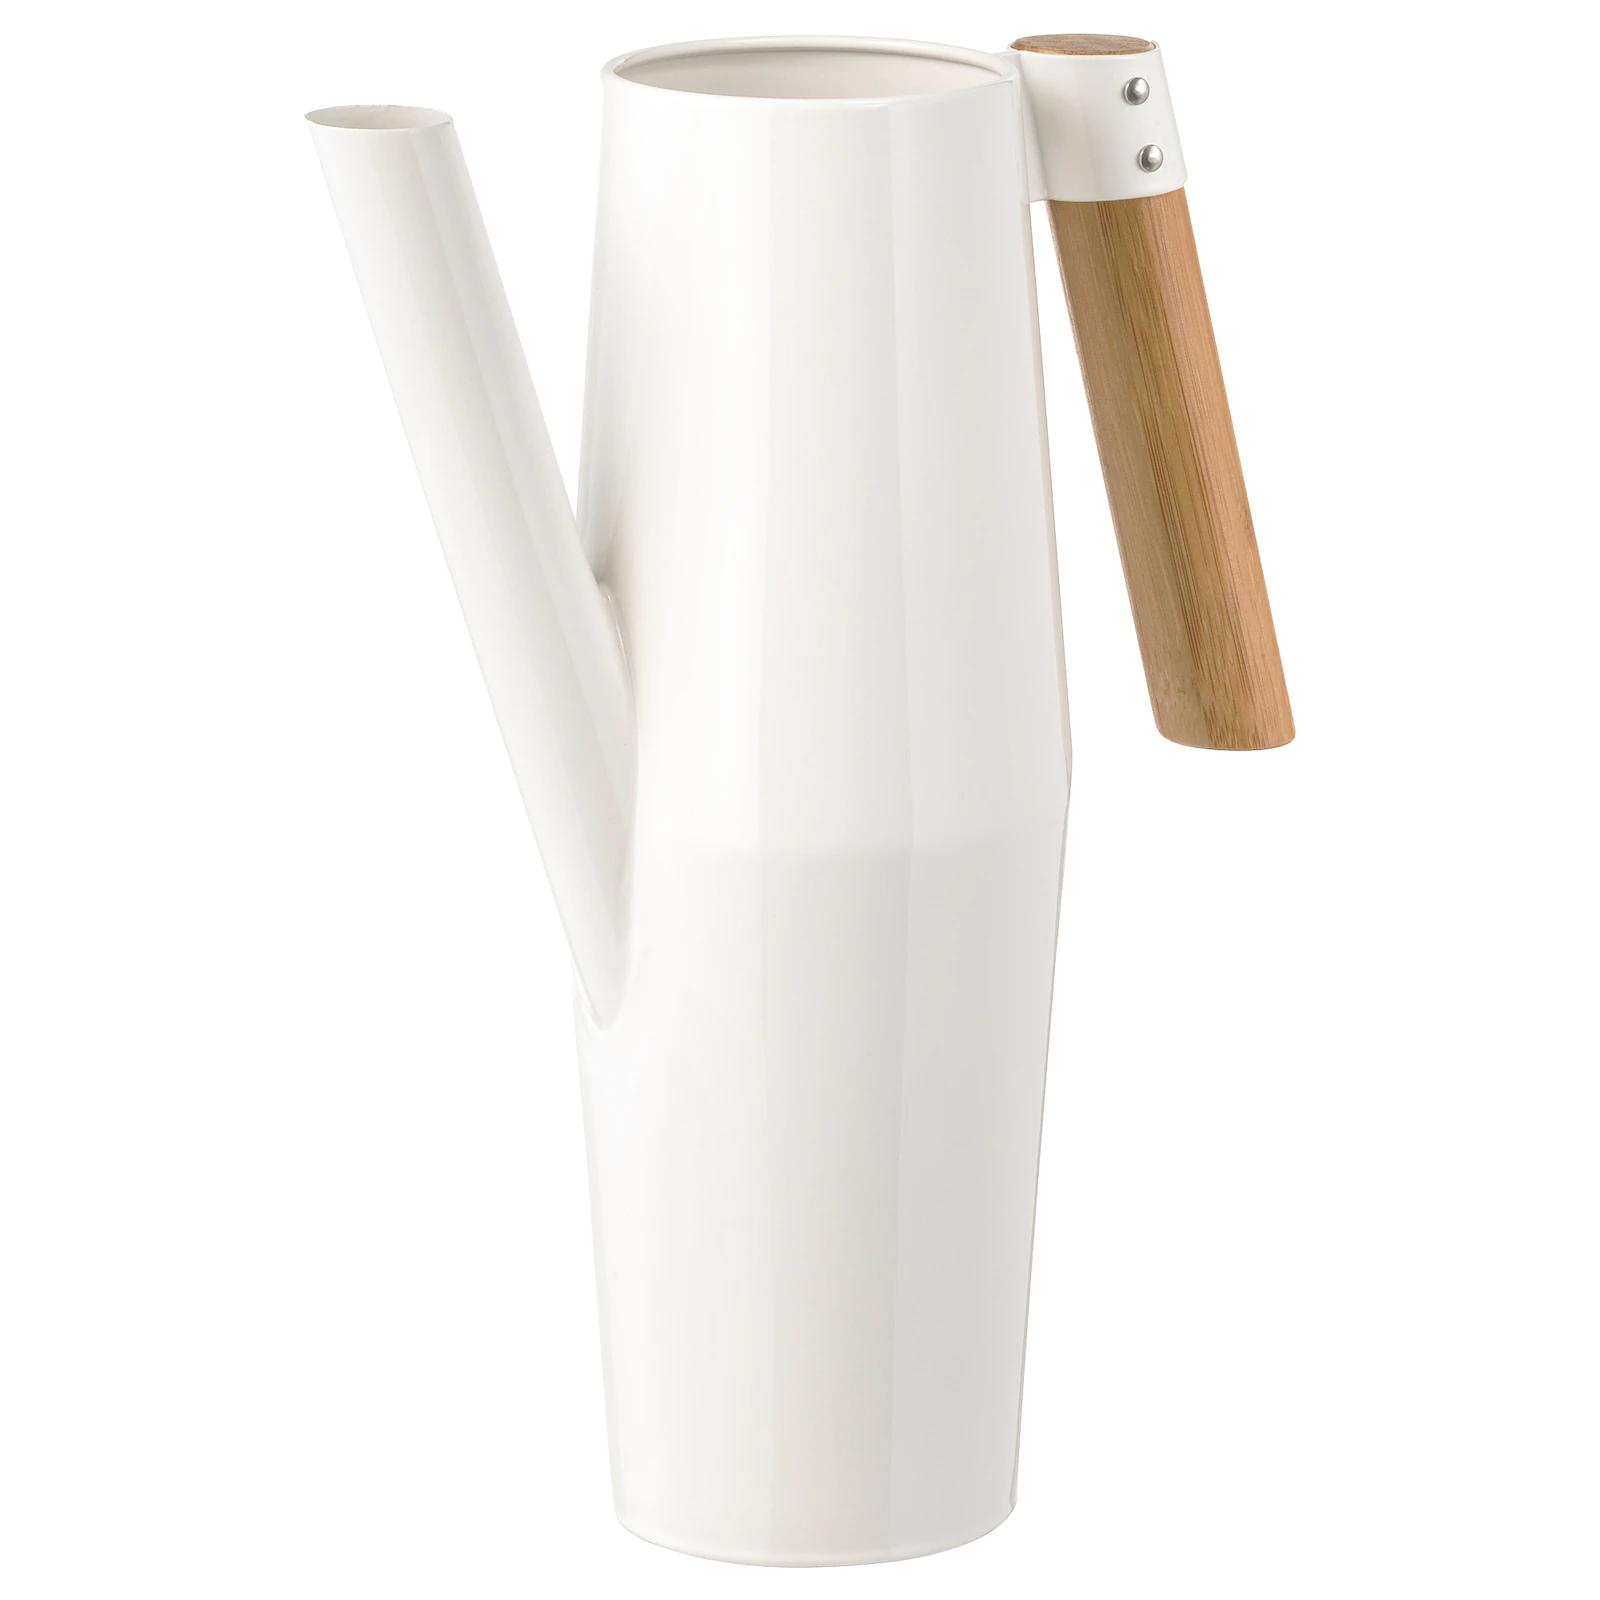 BITTERGURKA Watering can, white2 l